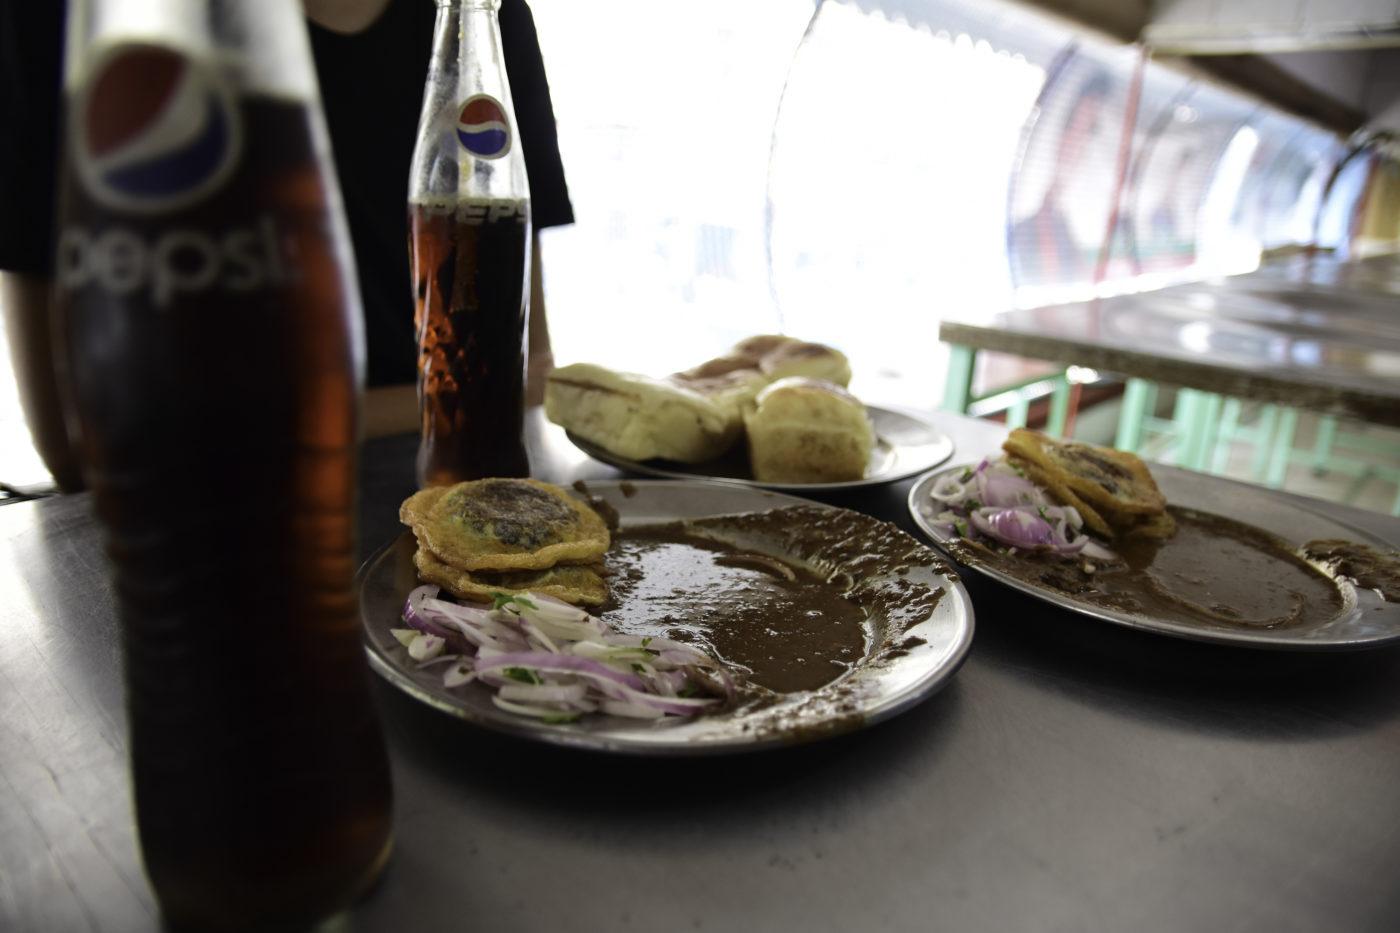 DSC 4511 - The Super Burgers of Pakistan Chowk